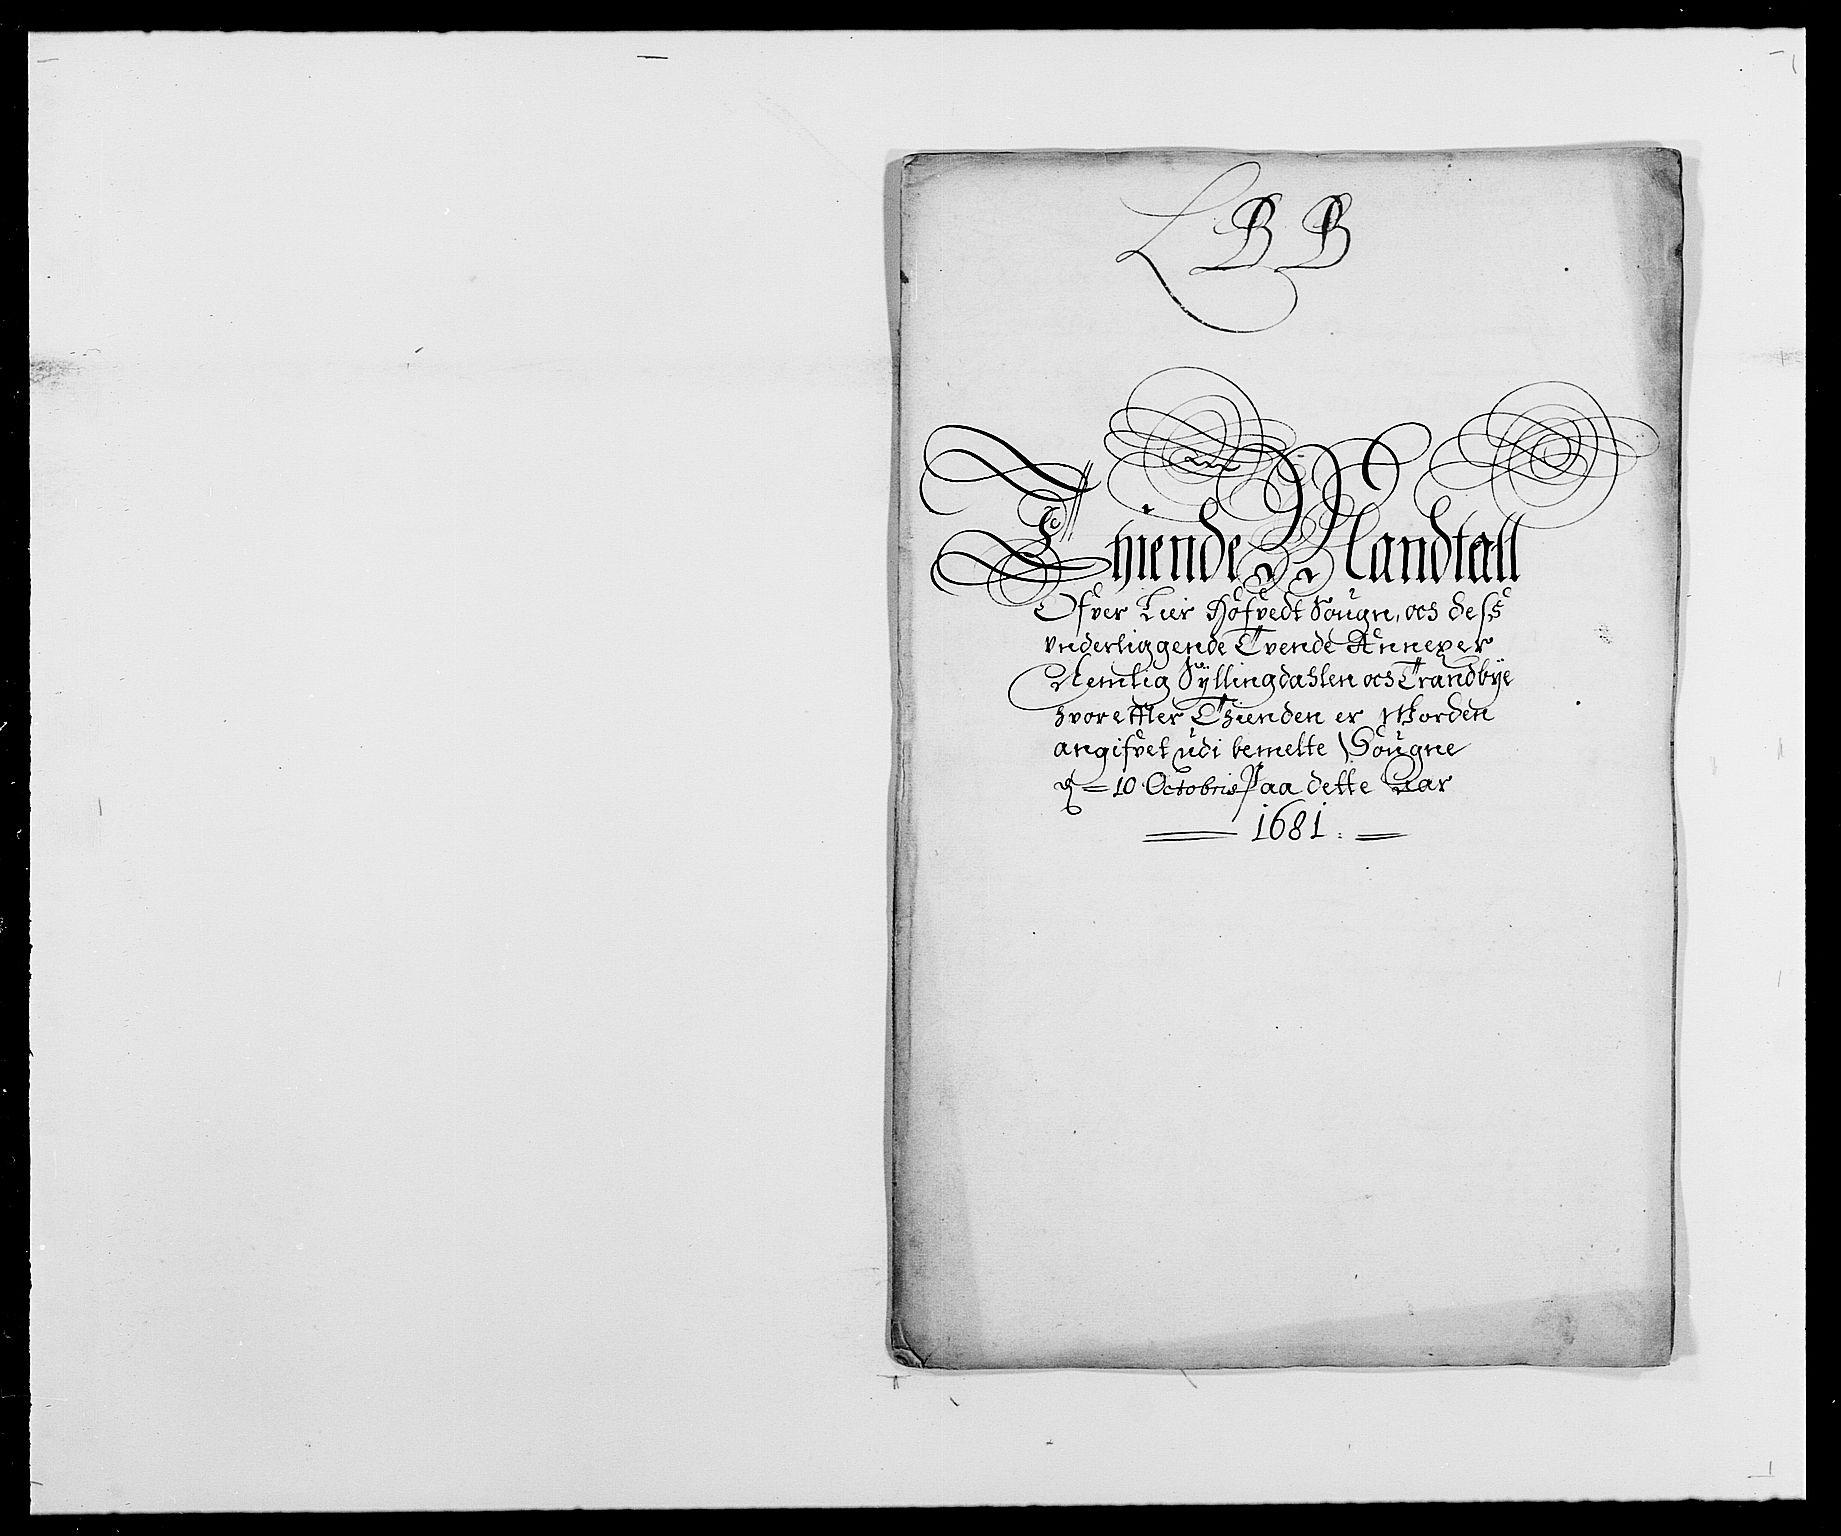 RA, Rentekammeret inntil 1814, Reviderte regnskaper, Fogderegnskap, R27/L1686: Fogderegnskap Lier, 1678-1686, s. 301